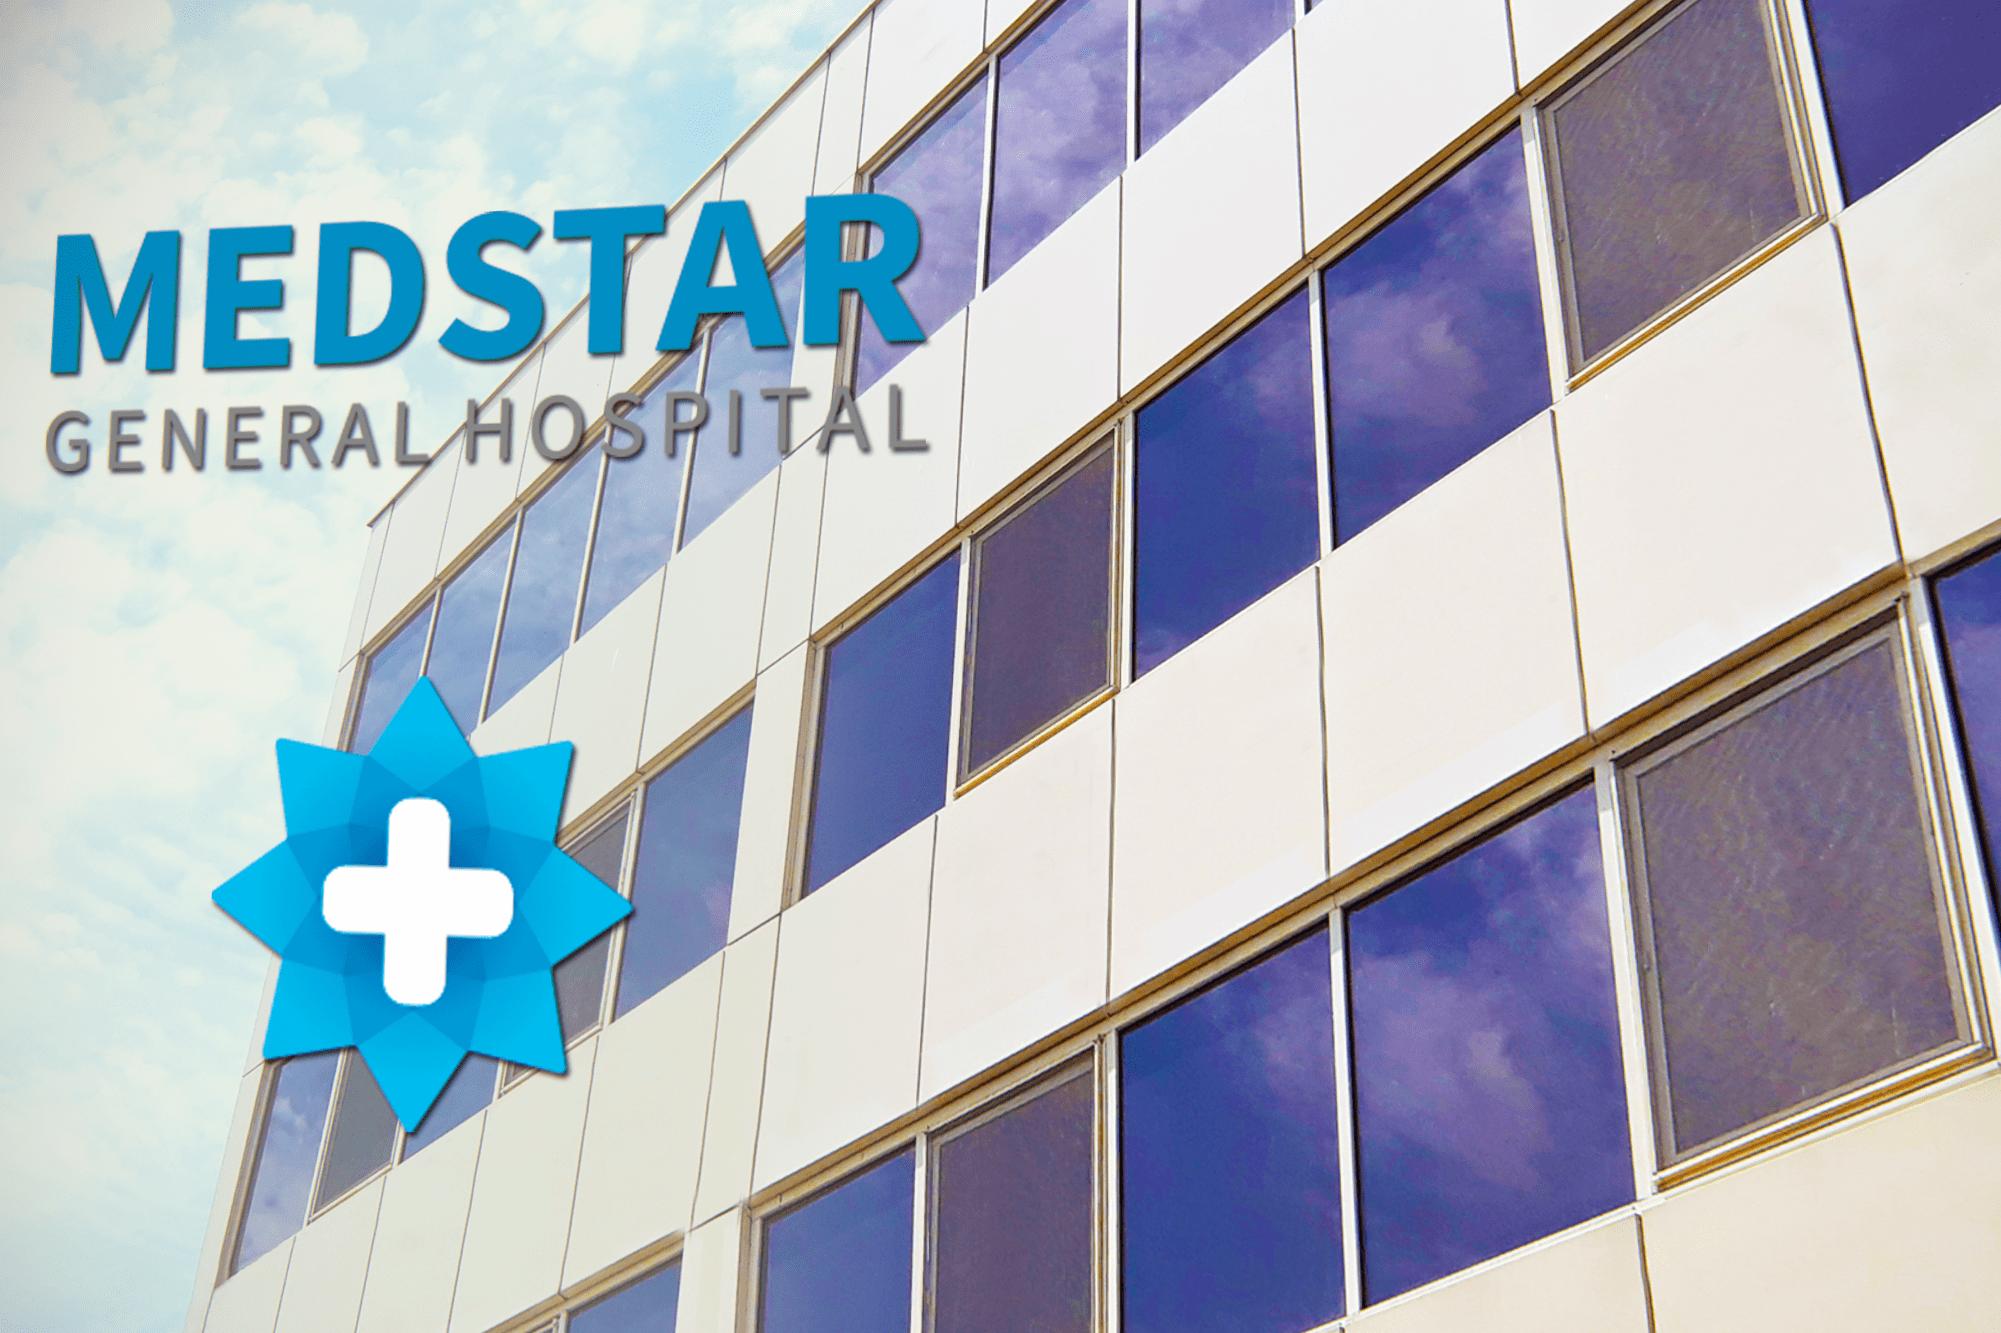 https://www.medstar2000.ro/wp-content/uploads/2018/05/MEDSTAR-General-Hospital-v1.png